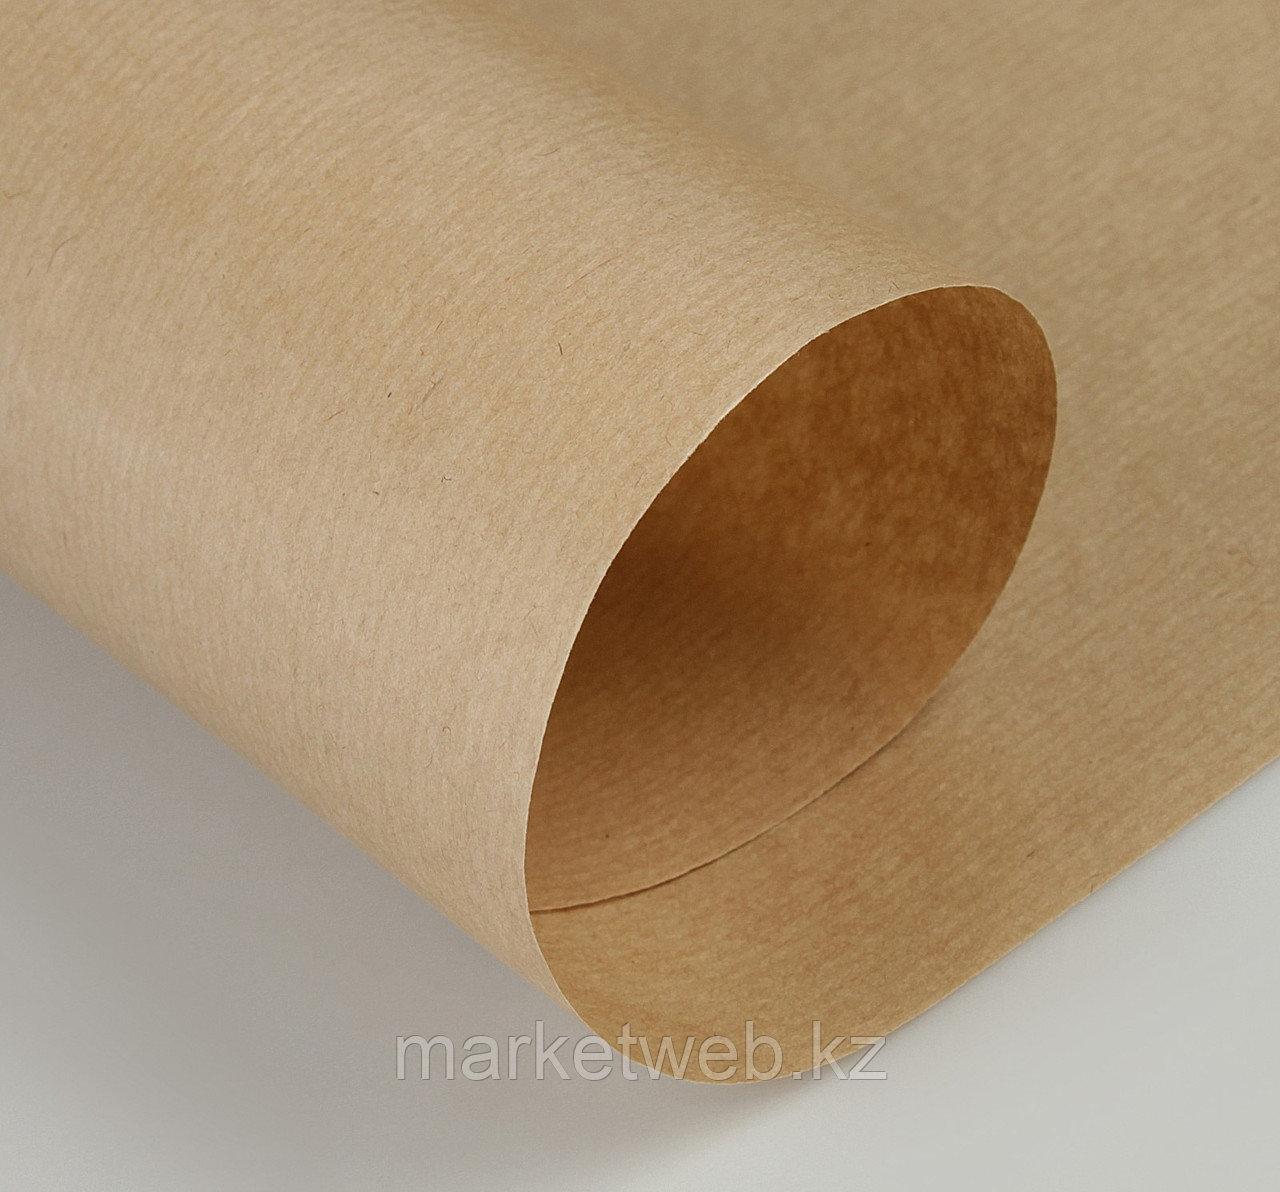 Бумага упаковочная крафт 0,72 x 50 м - фото 5